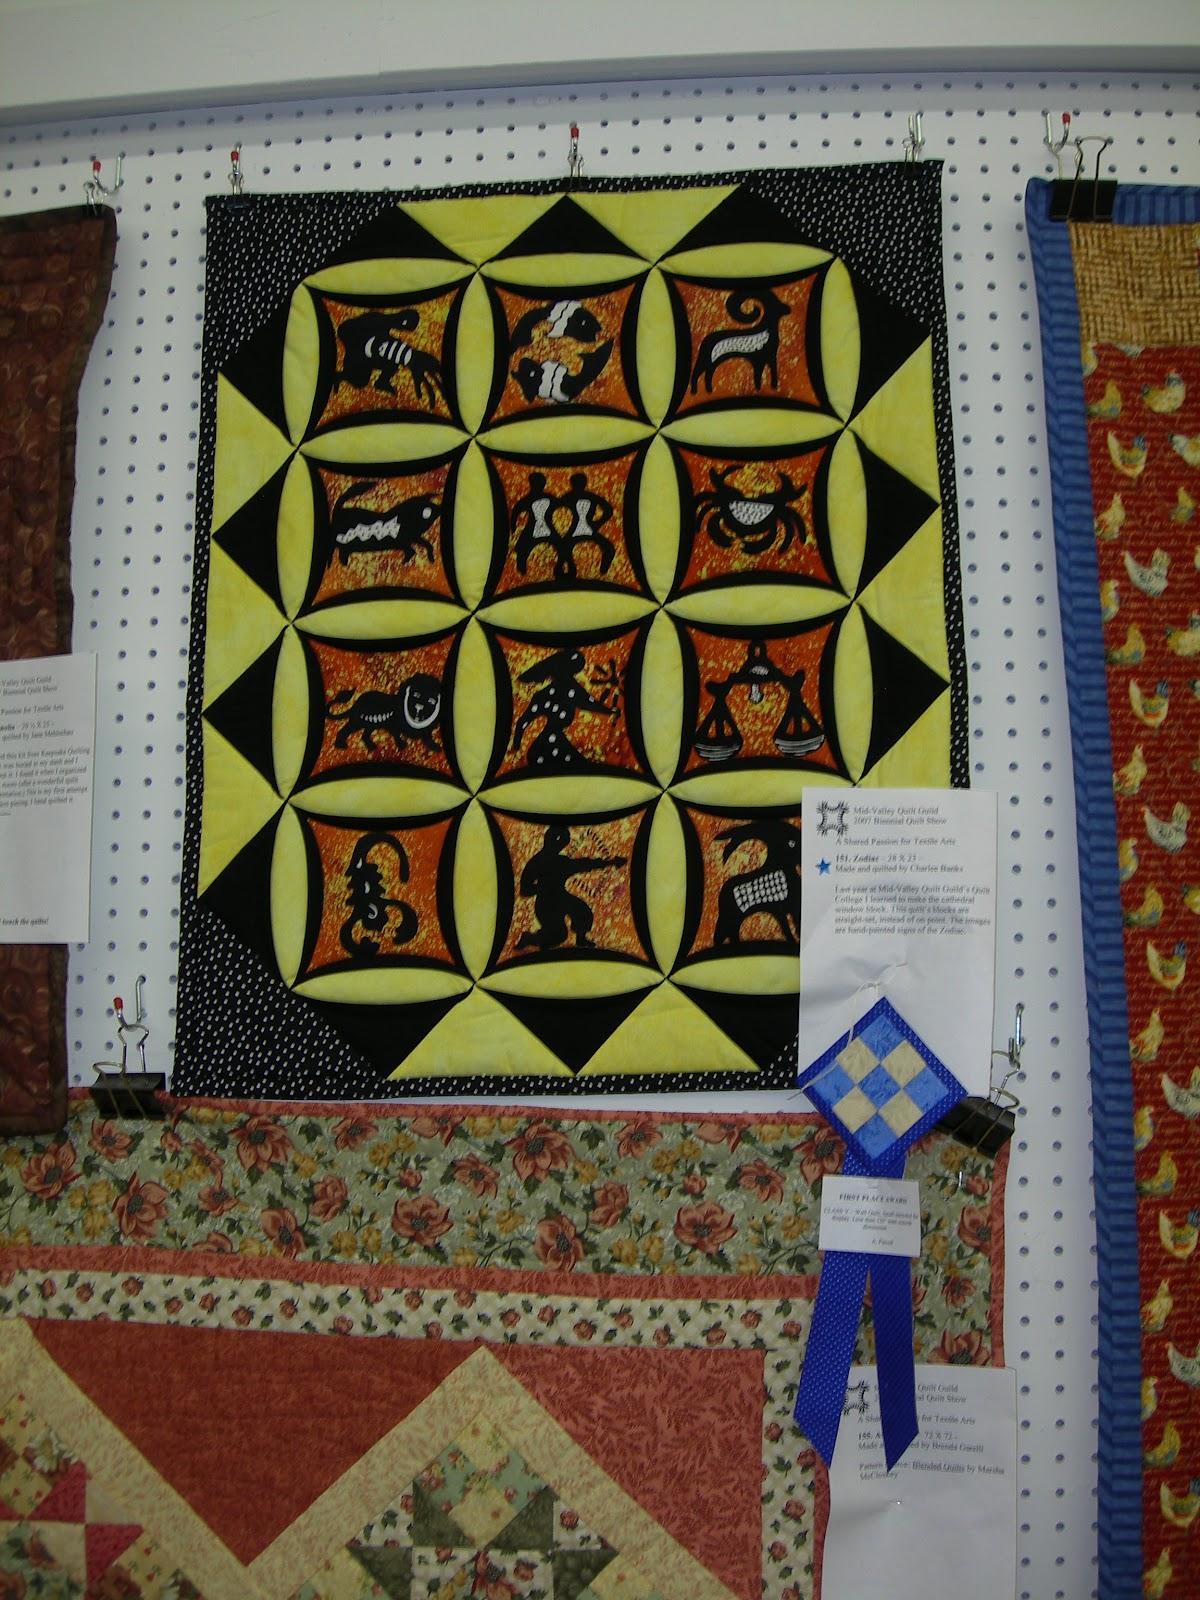 michele bilyeu creates with heart and hands miniature